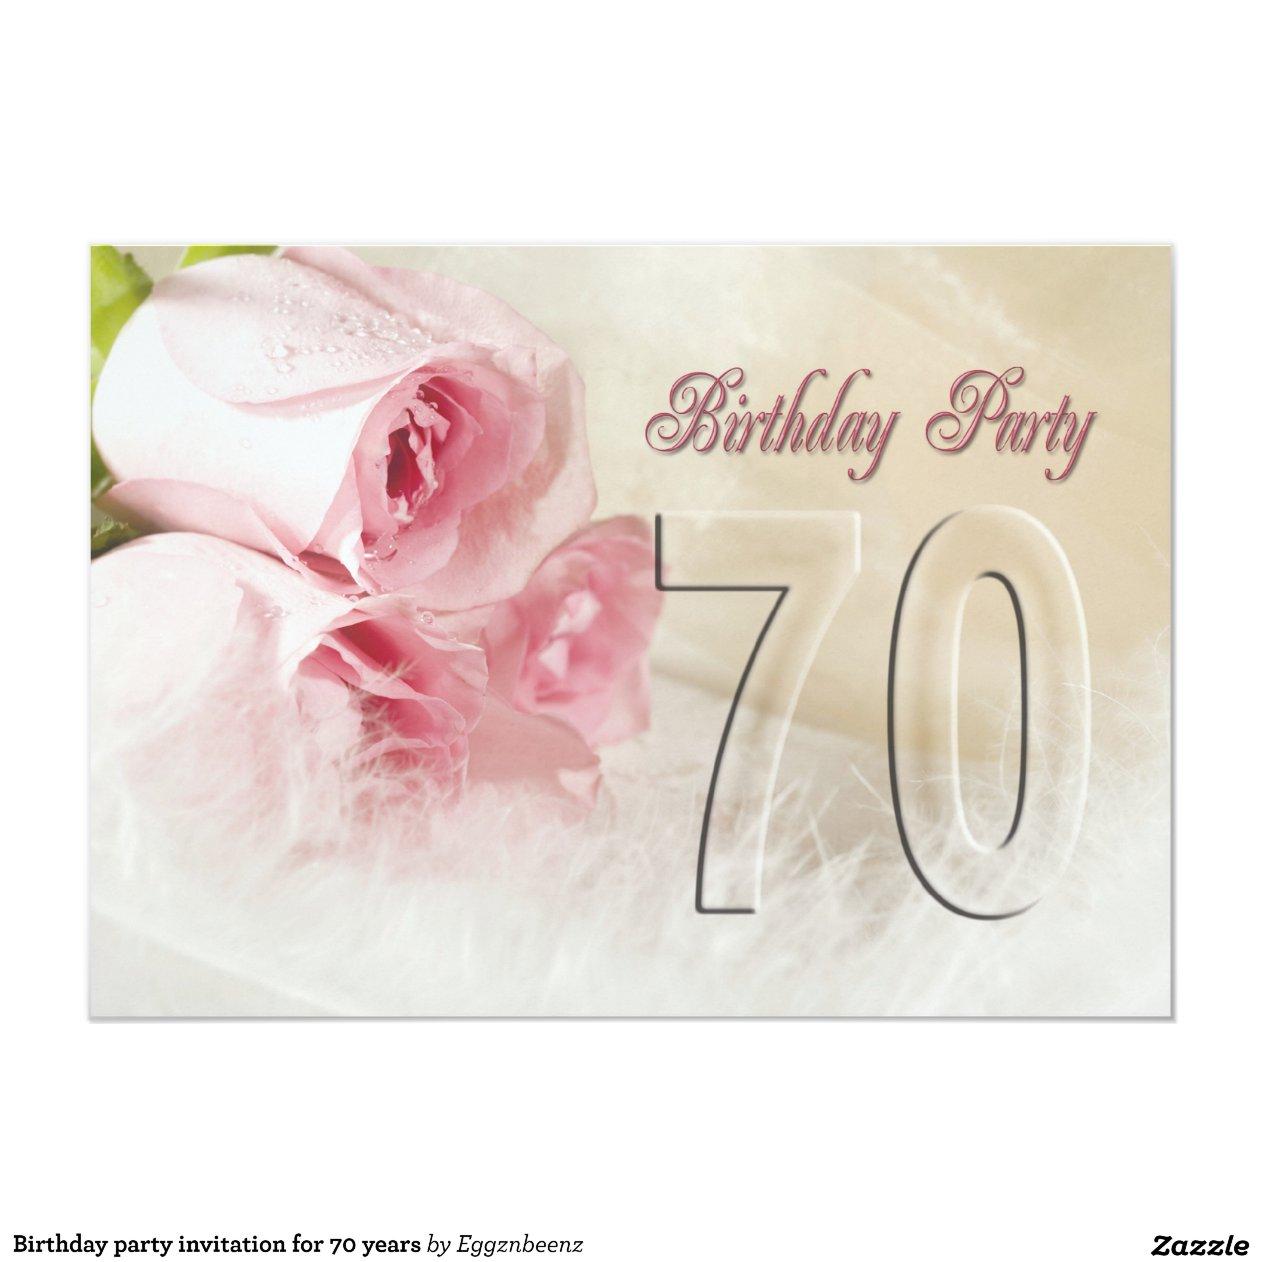 Convite Aniversario 70 Anos Feminino Convite de Aniversário Por 70